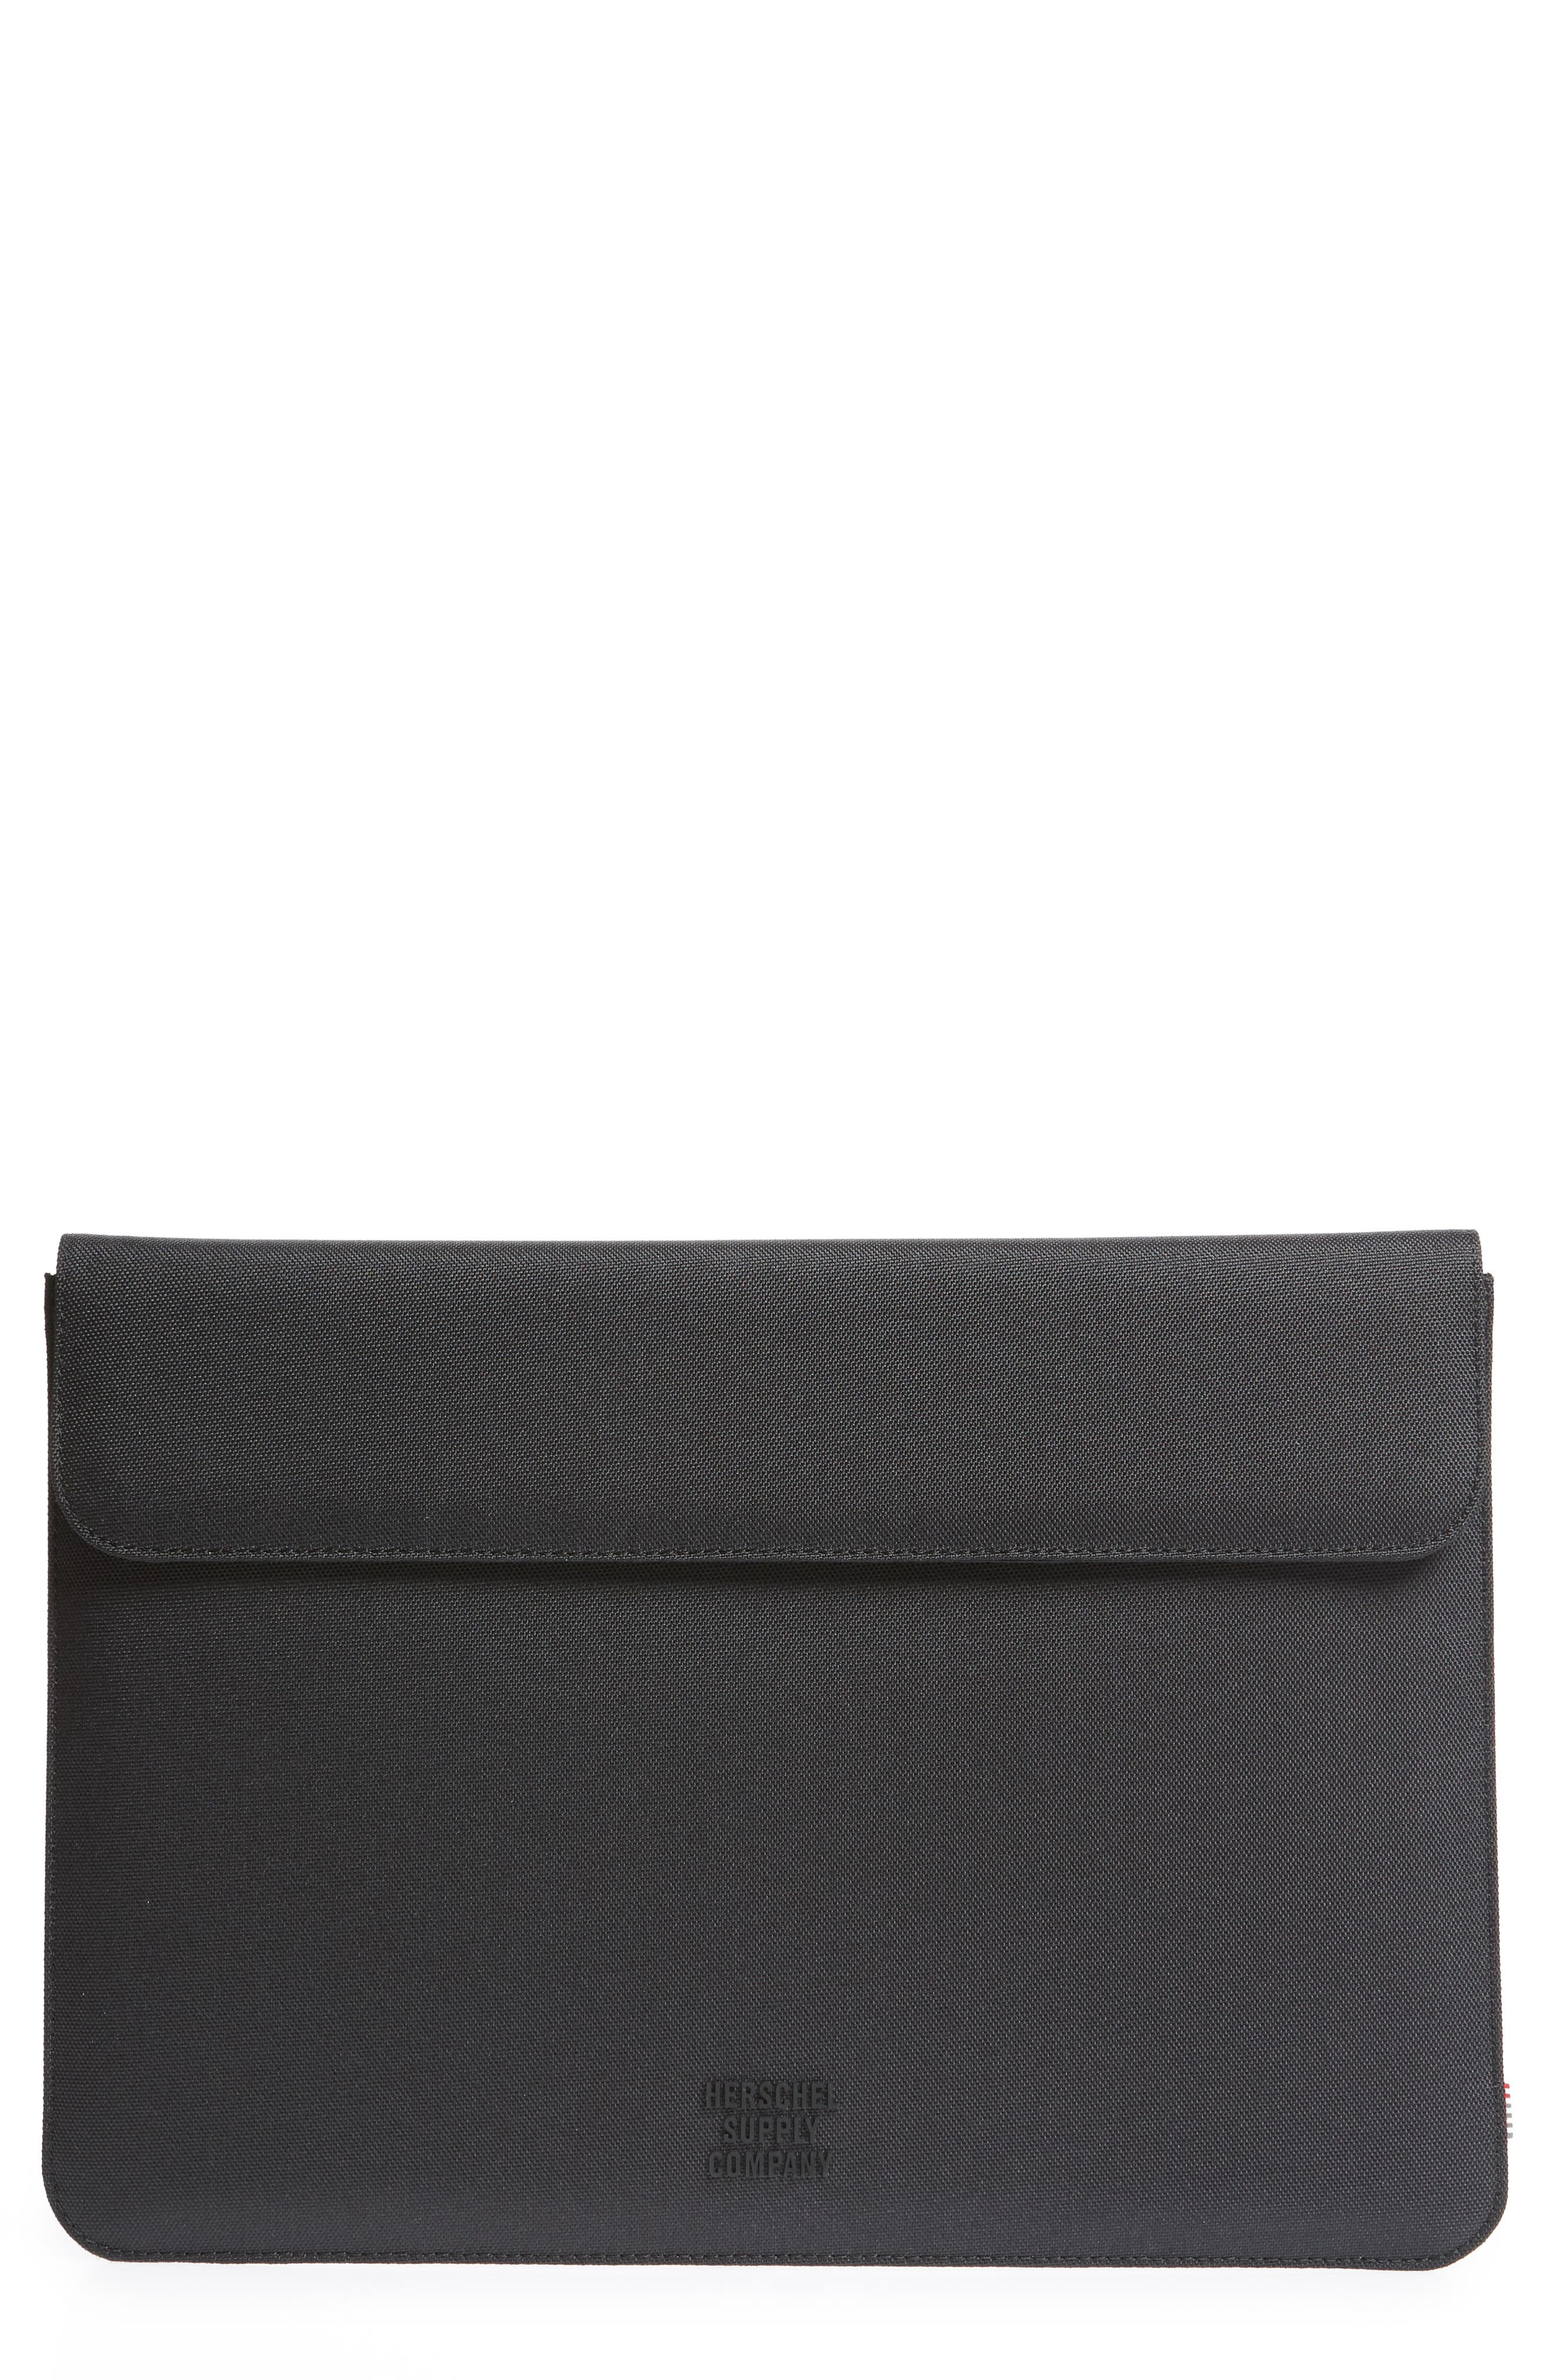 Spokane 13-Inch Macbook Canvas Sleeve